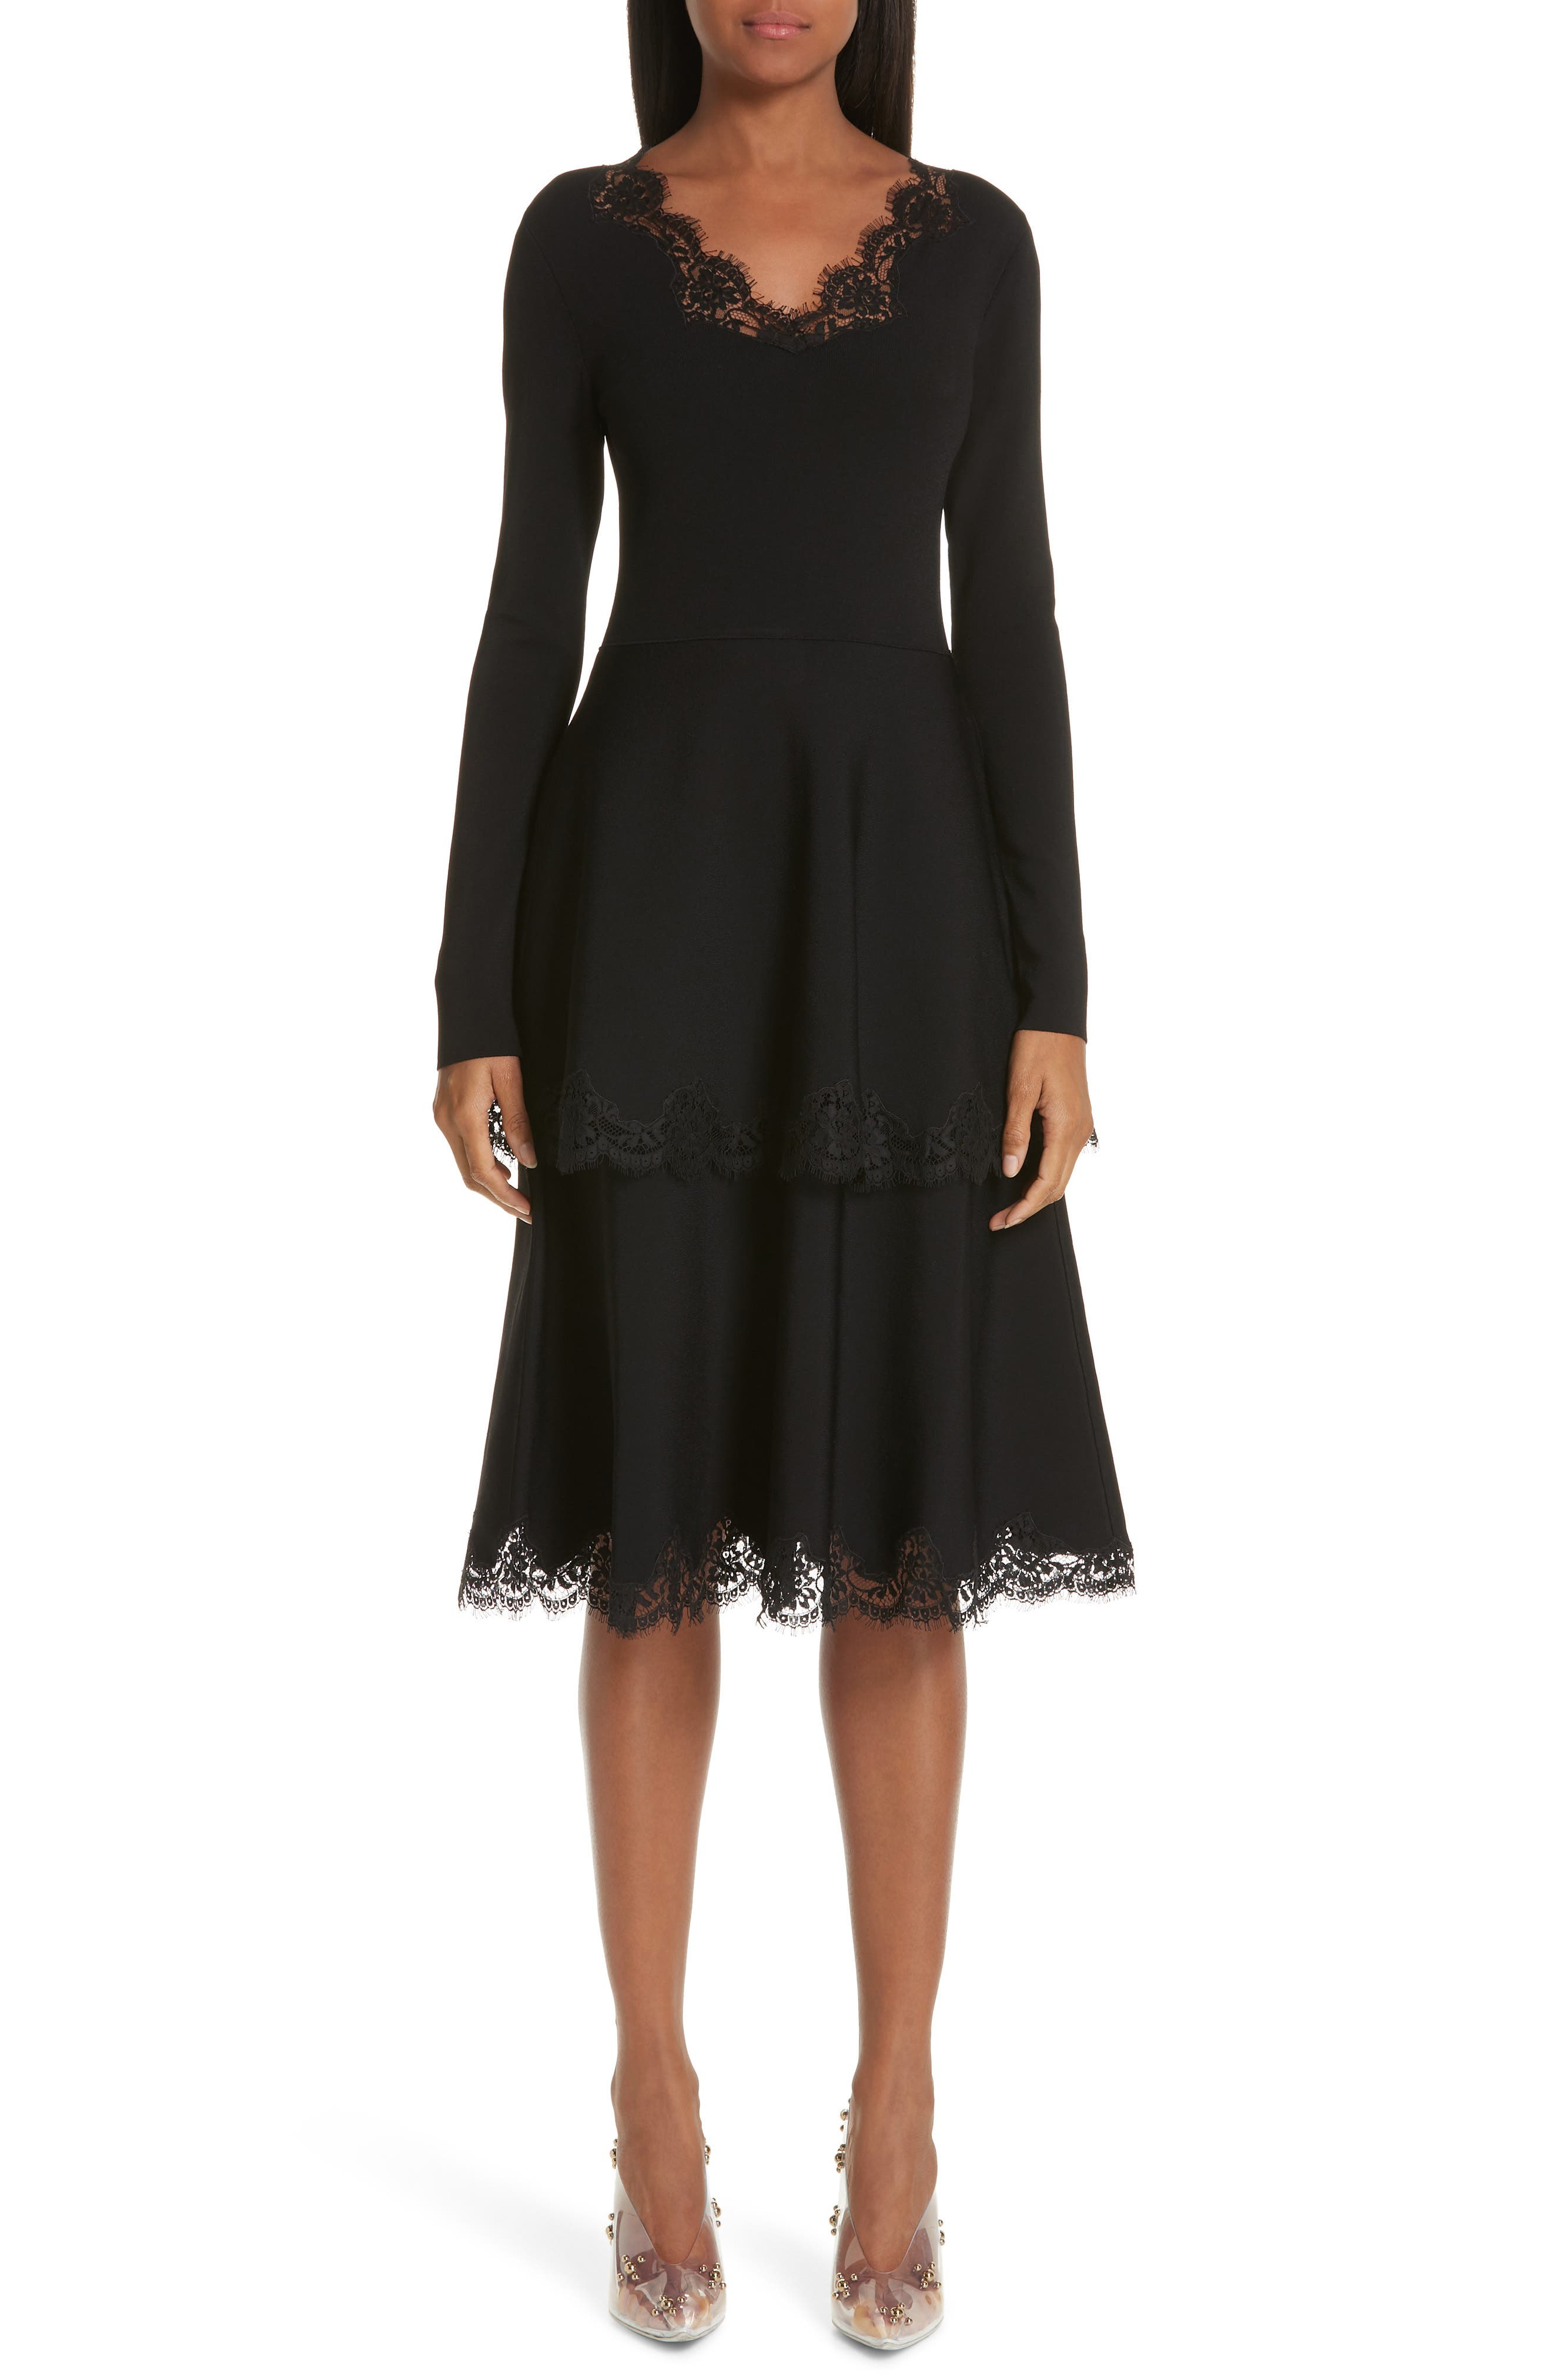 Stella Mccartney Lace Trim Tiered Sweater Dress, US / 40 IT - Black